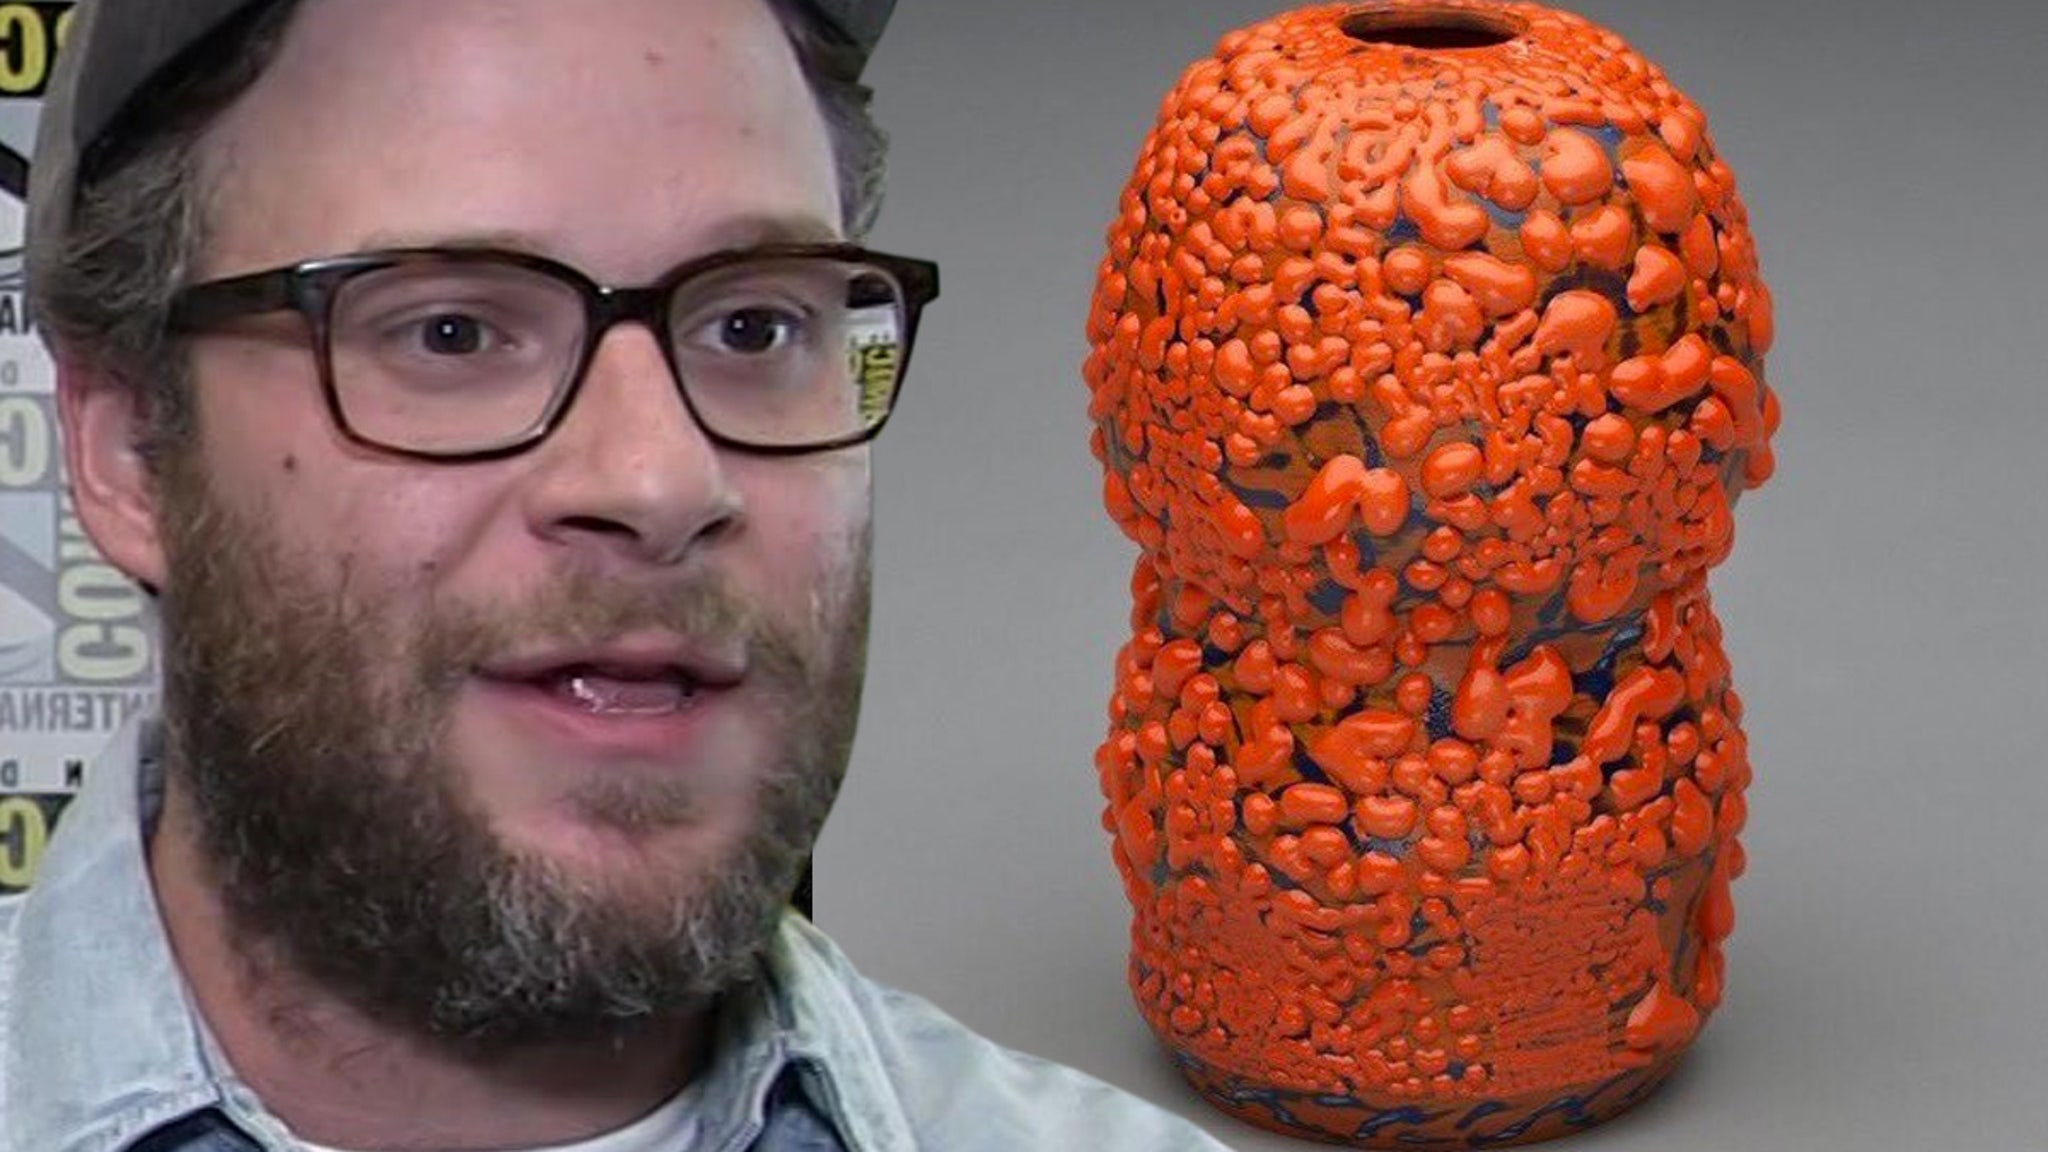 Seth Rogen's Ceramic Vase Sells for Thousands at Auction